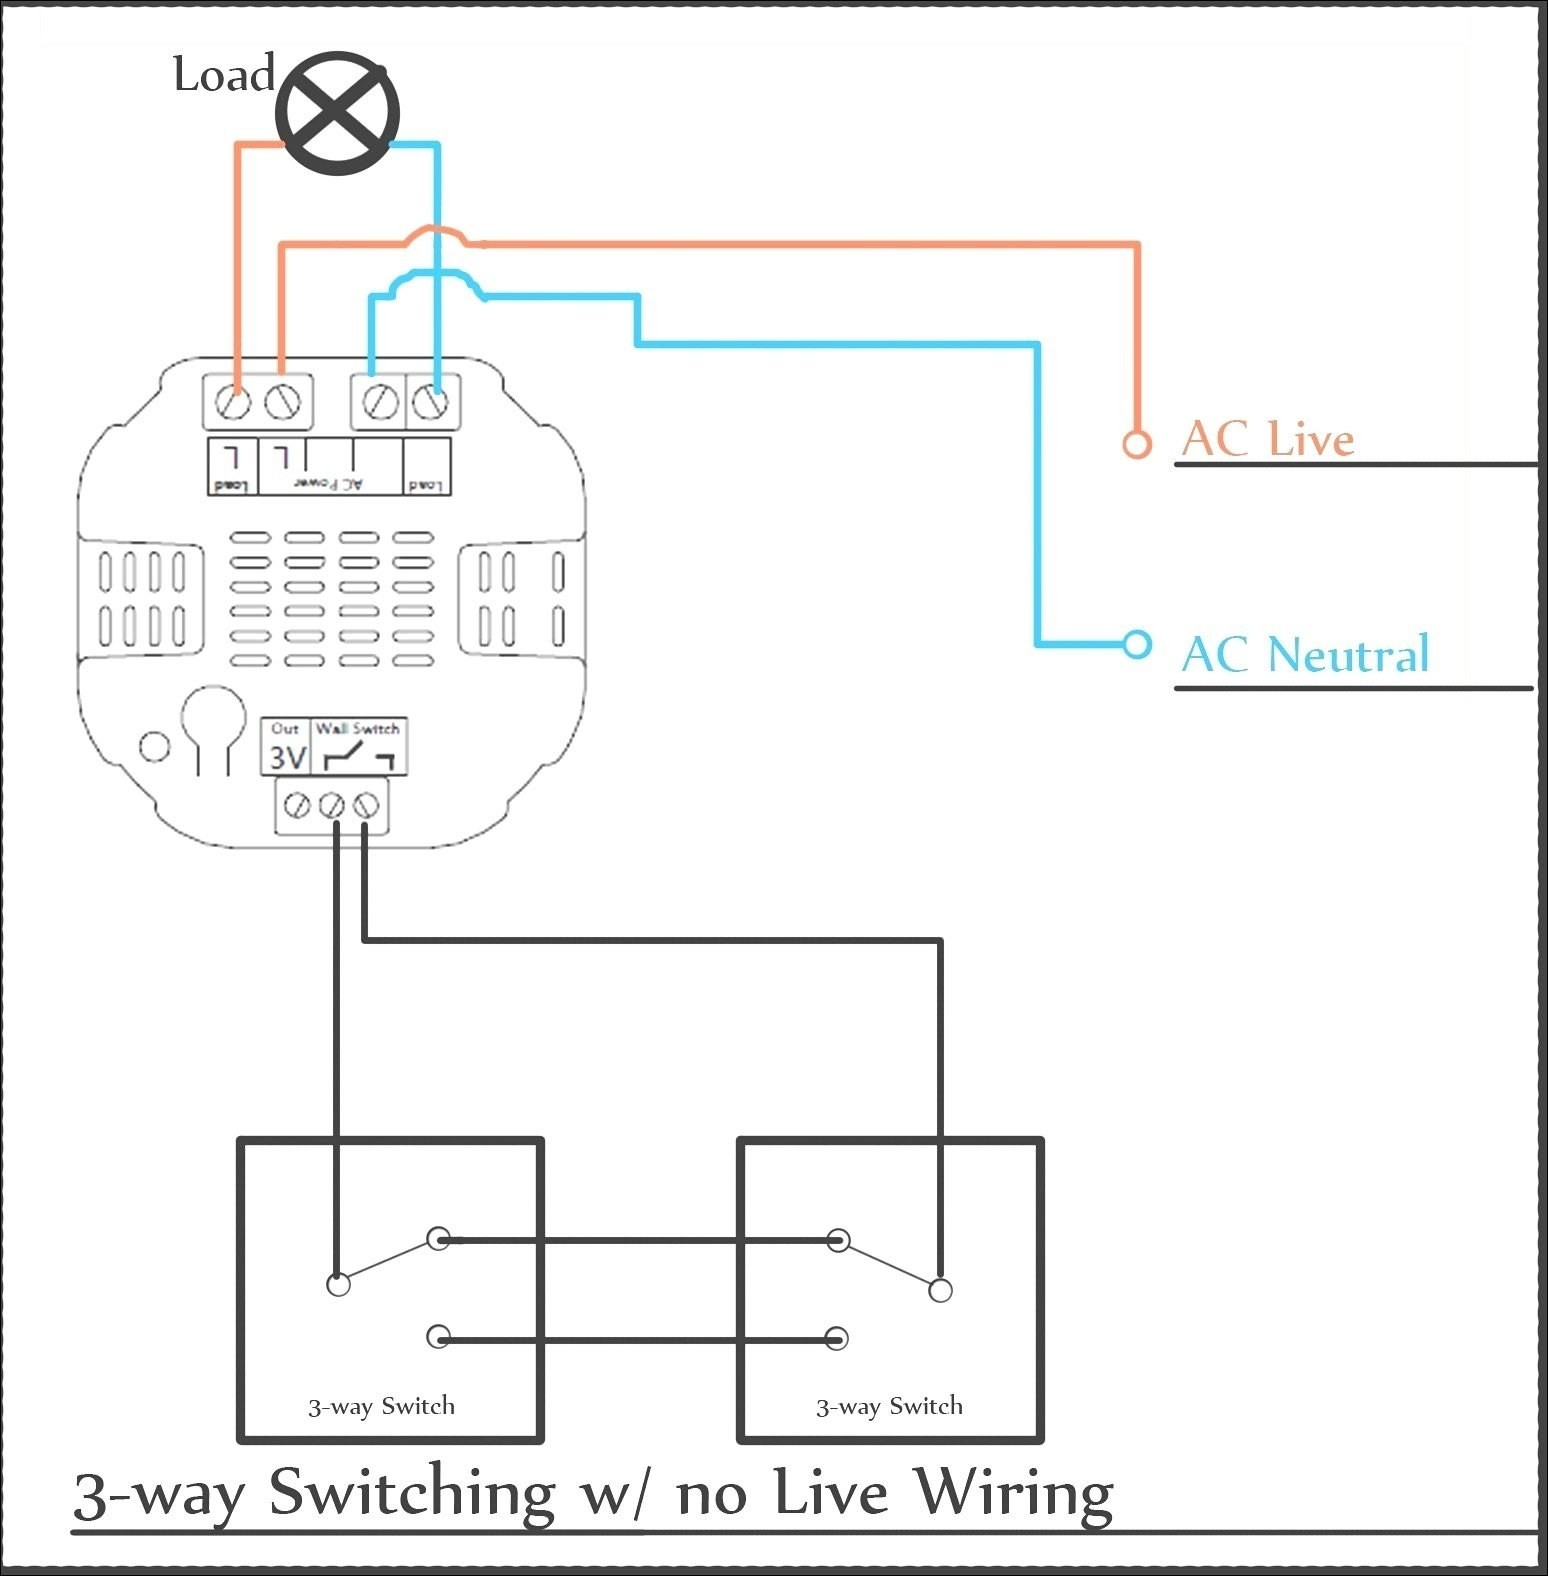 Leviton Decora 3 Way Switch Wiring Diagram 5603 Cf 4214] Wiring A 3 Way Switch Leviton Free Diagram Of Leviton Decora 3 Way Switch Wiring Diagram 5603